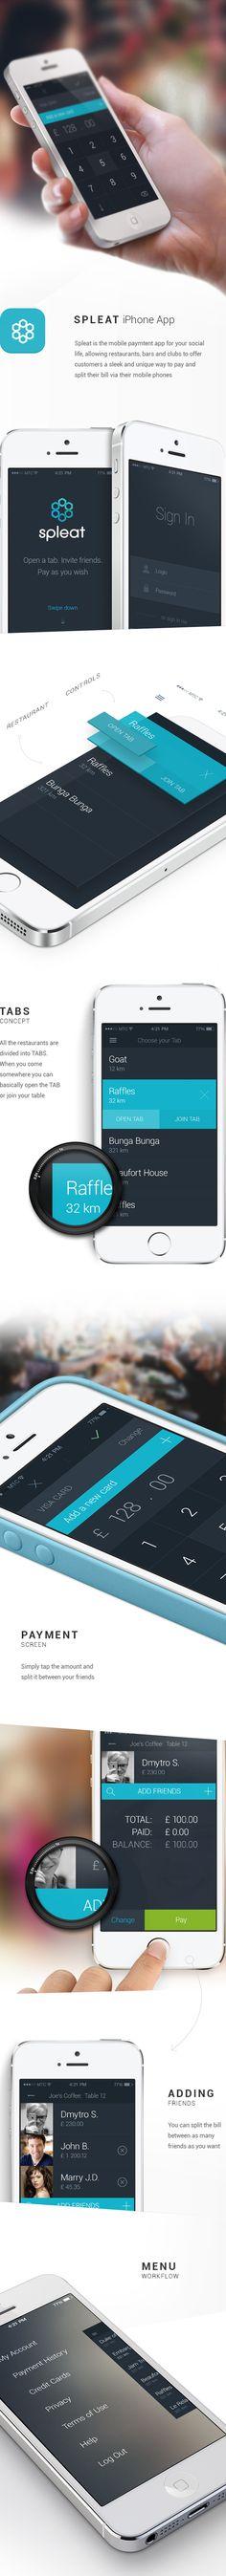 Mobile Screen Design Template